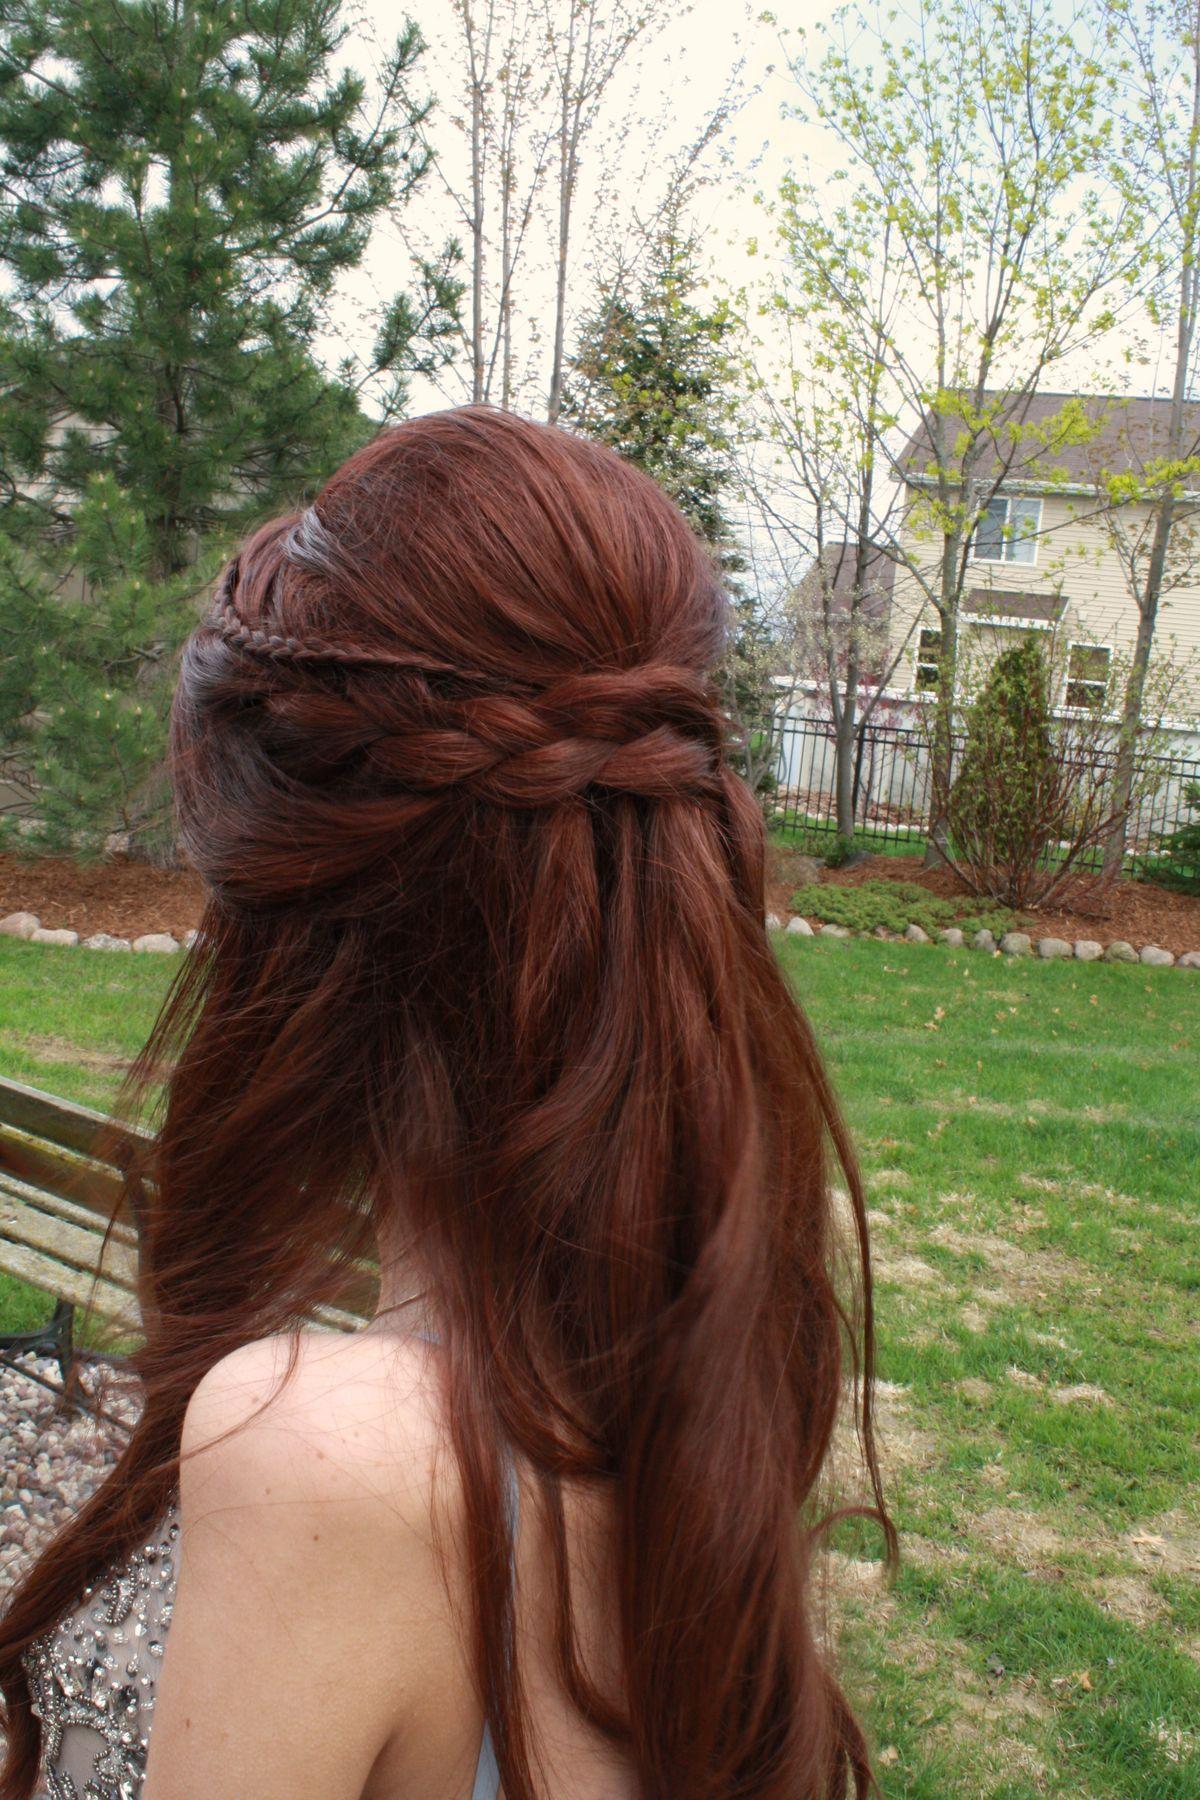 Aceecaeaecccceg  pixels  Hair